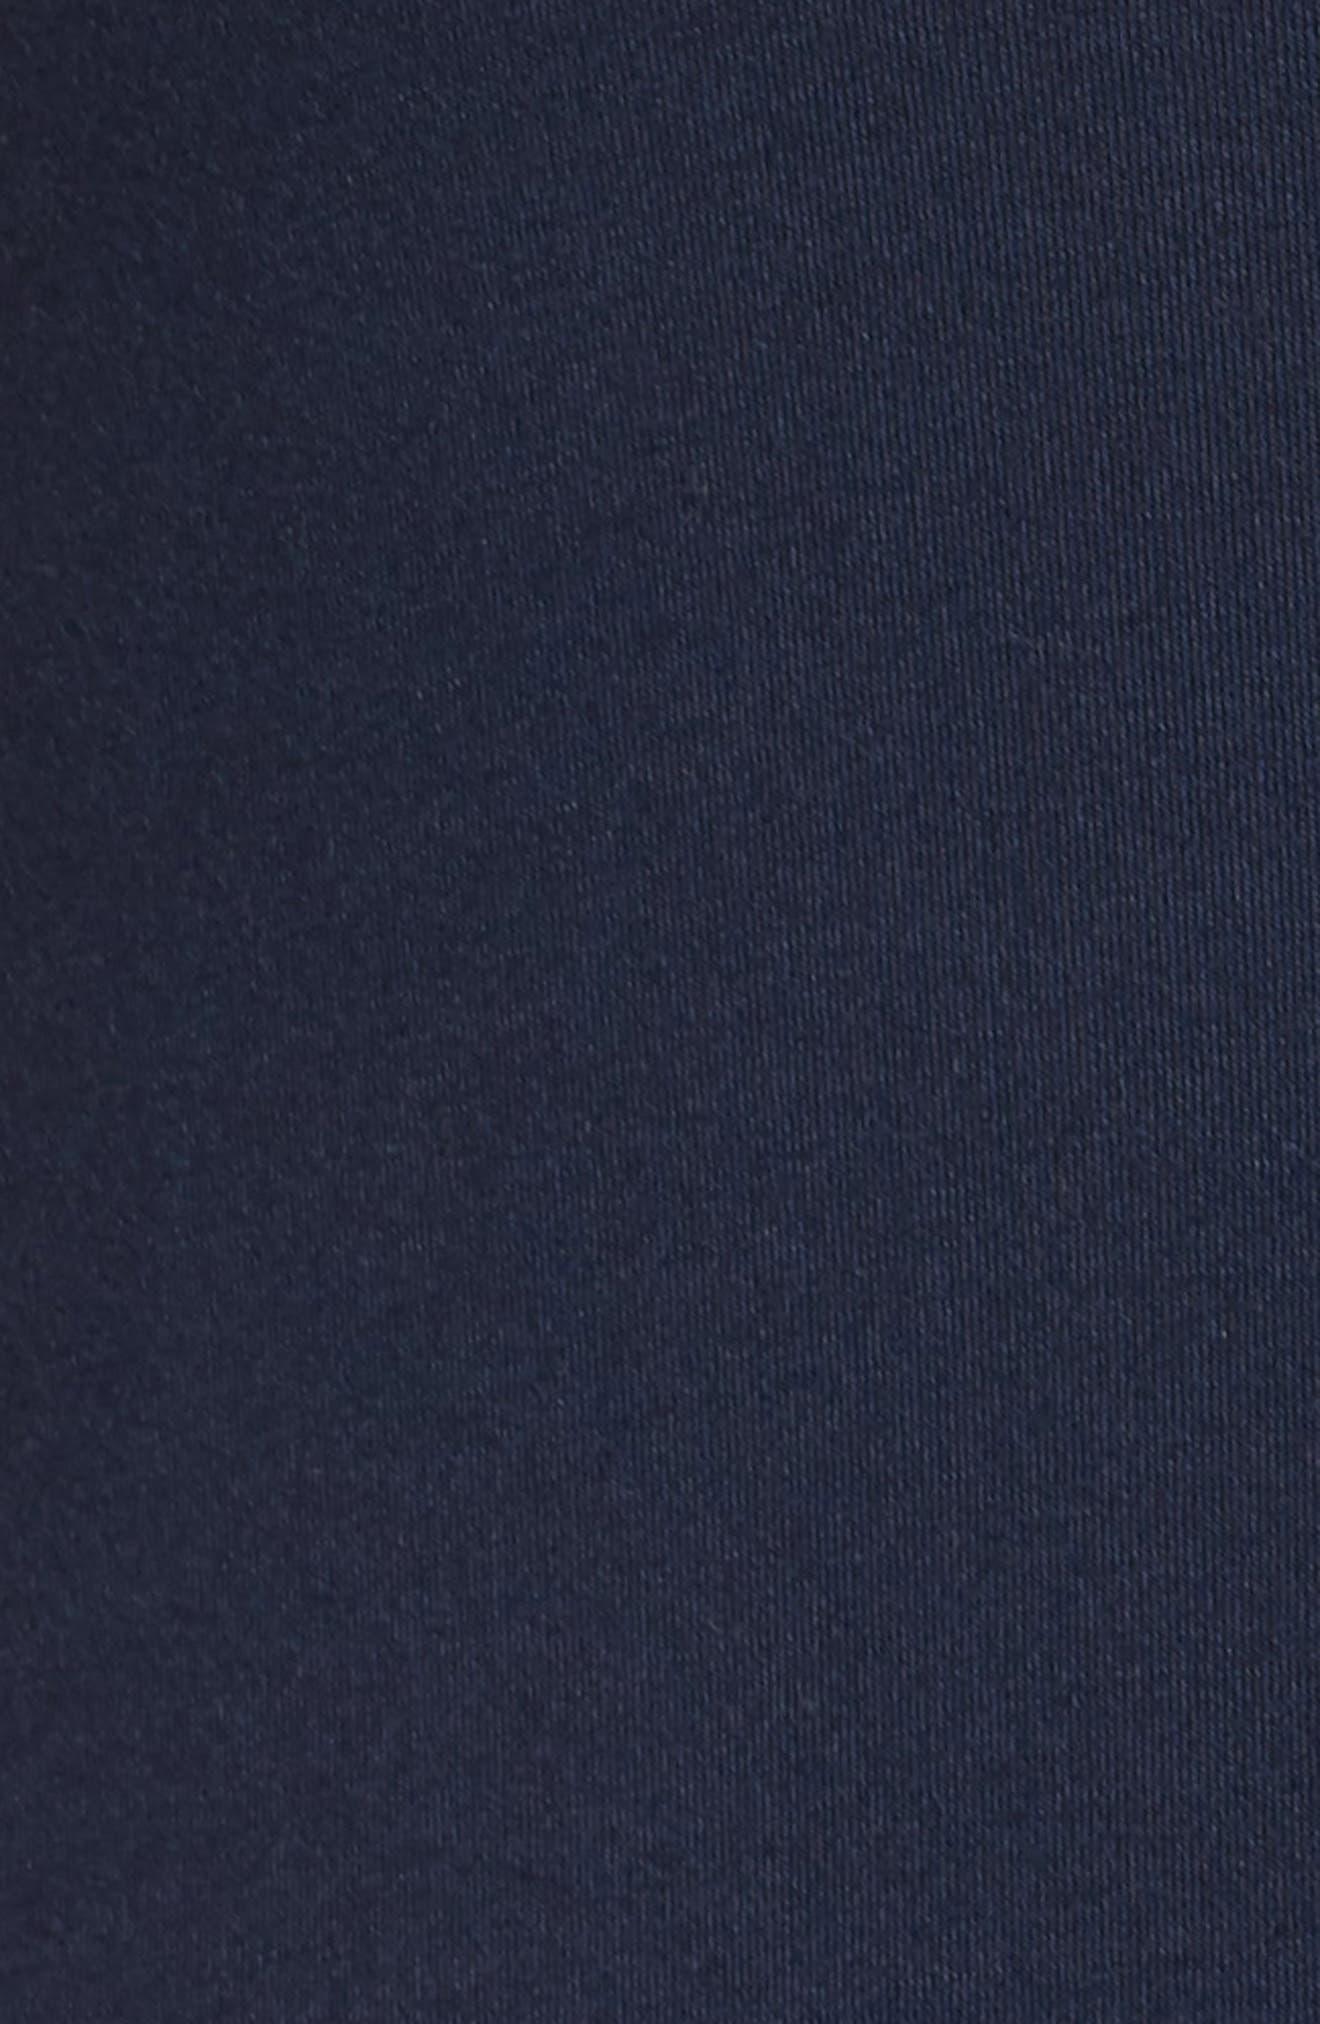 A-Line Maxi Dress,                             Alternate thumbnail 7, color,                             Midnight